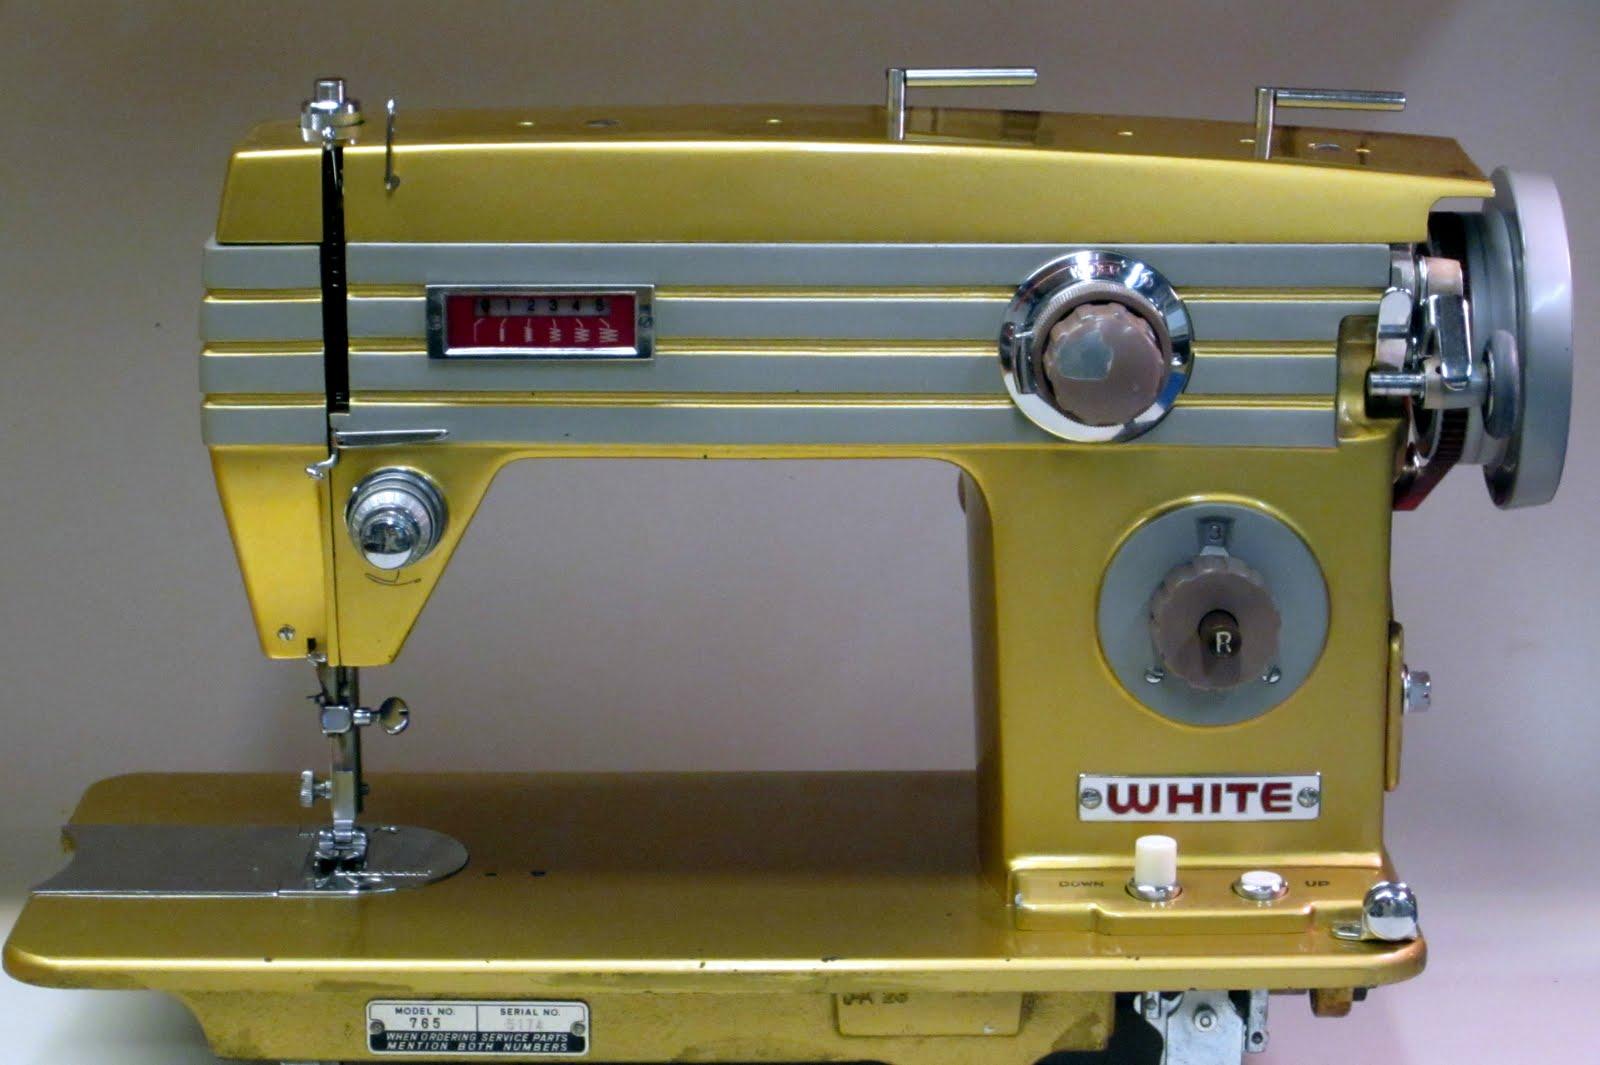 mi vintage sewing machines white 765 1965. Black Bedroom Furniture Sets. Home Design Ideas